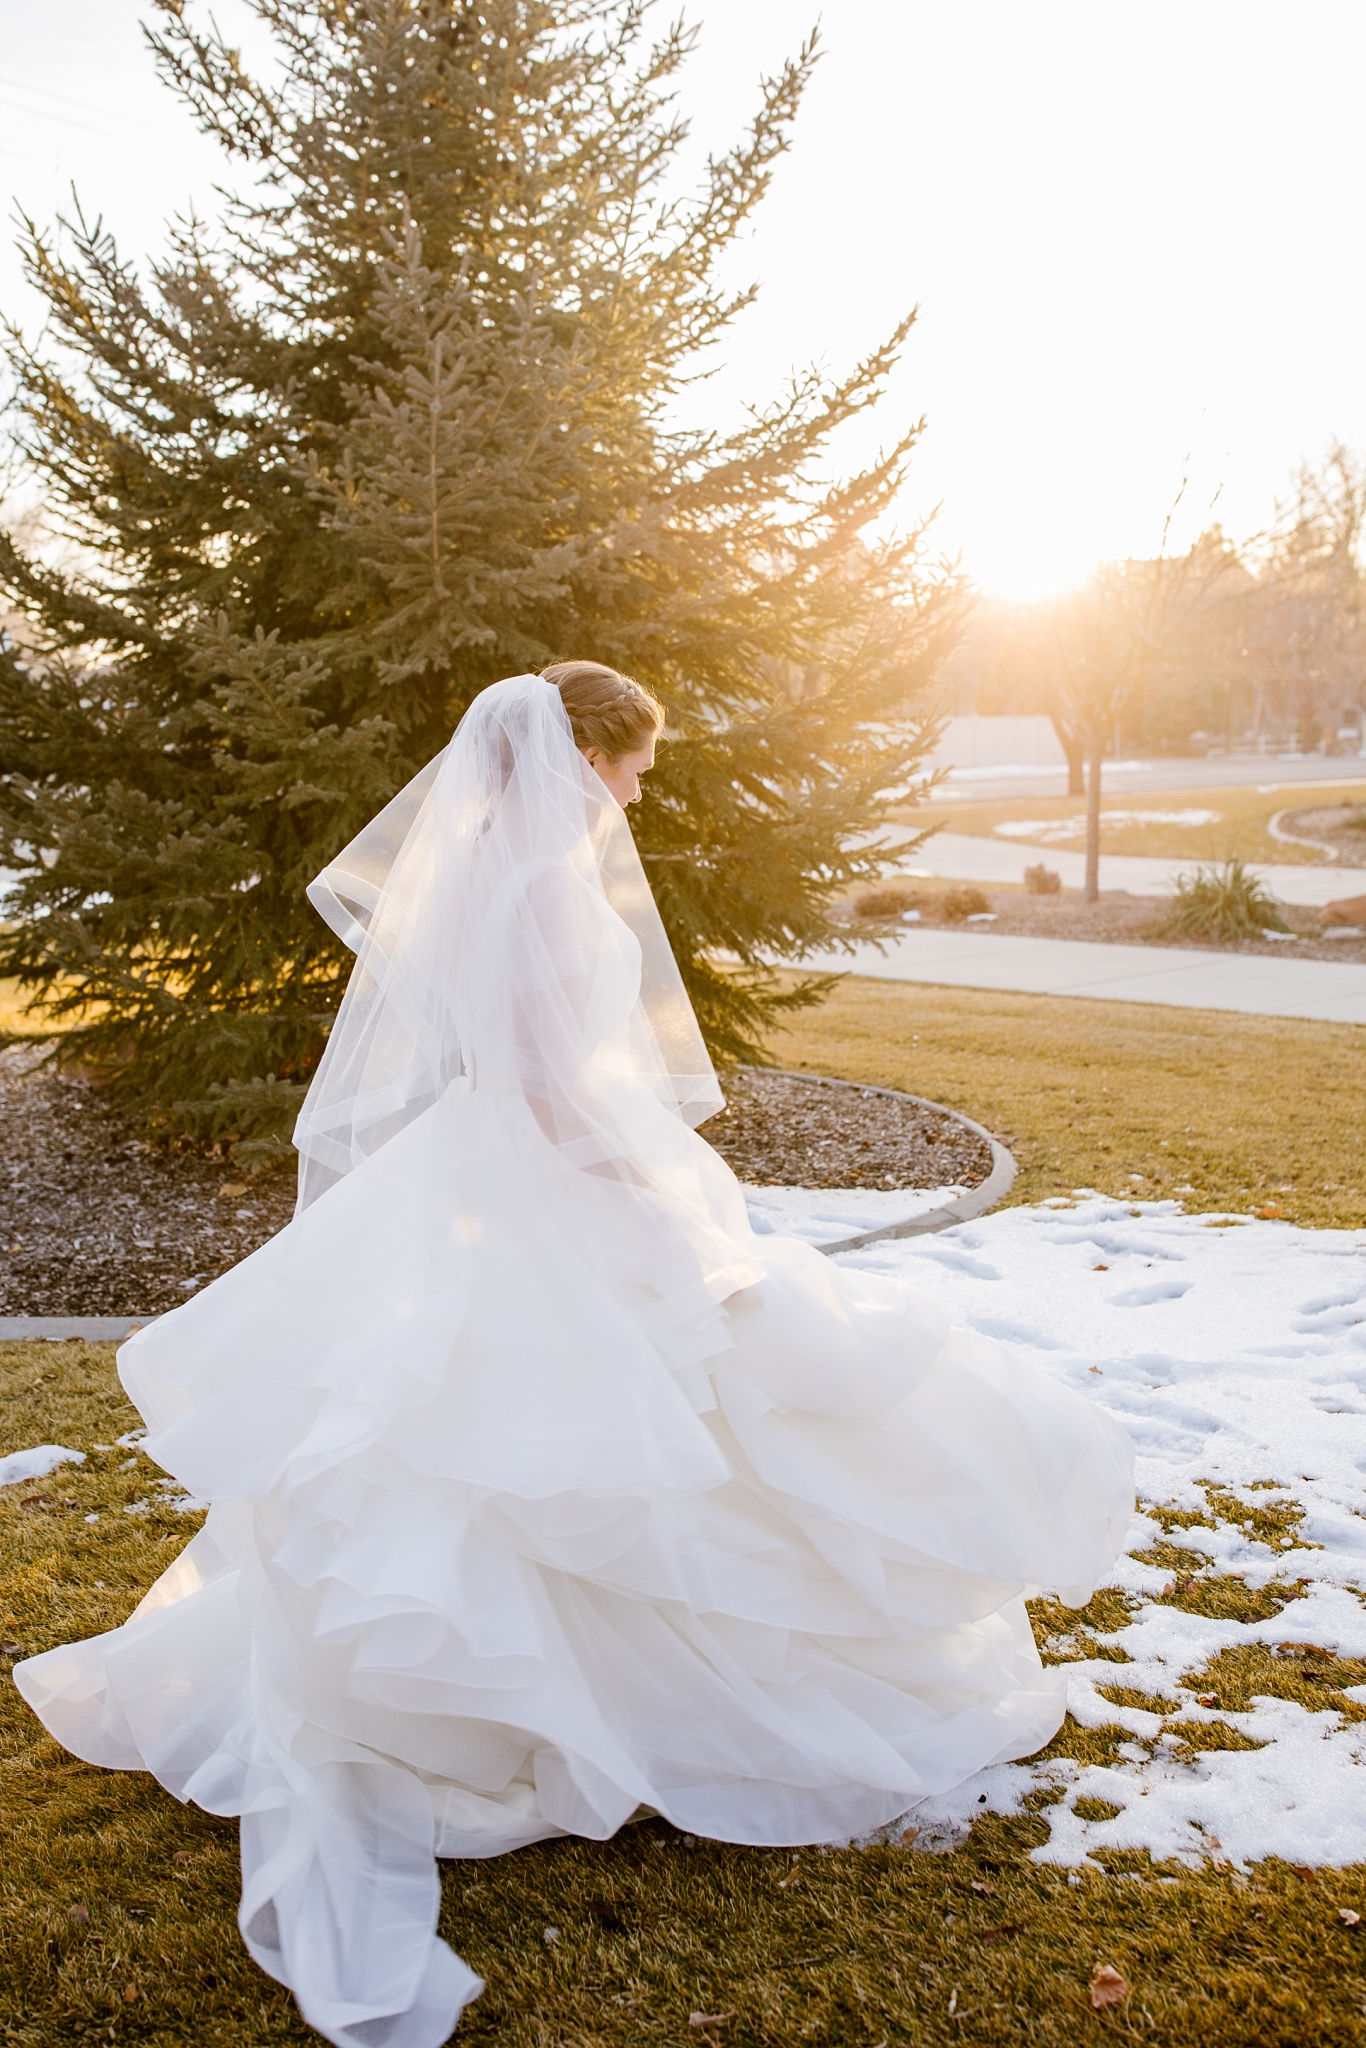 CN-Wedding-259_Lizzie-B-Imagery-Utah-Wedding-Photographer-Blessed-Sacrament-Catholic-Church-Sandy-Utah-The-Blended-Table-Salt-Lake-City.jpg